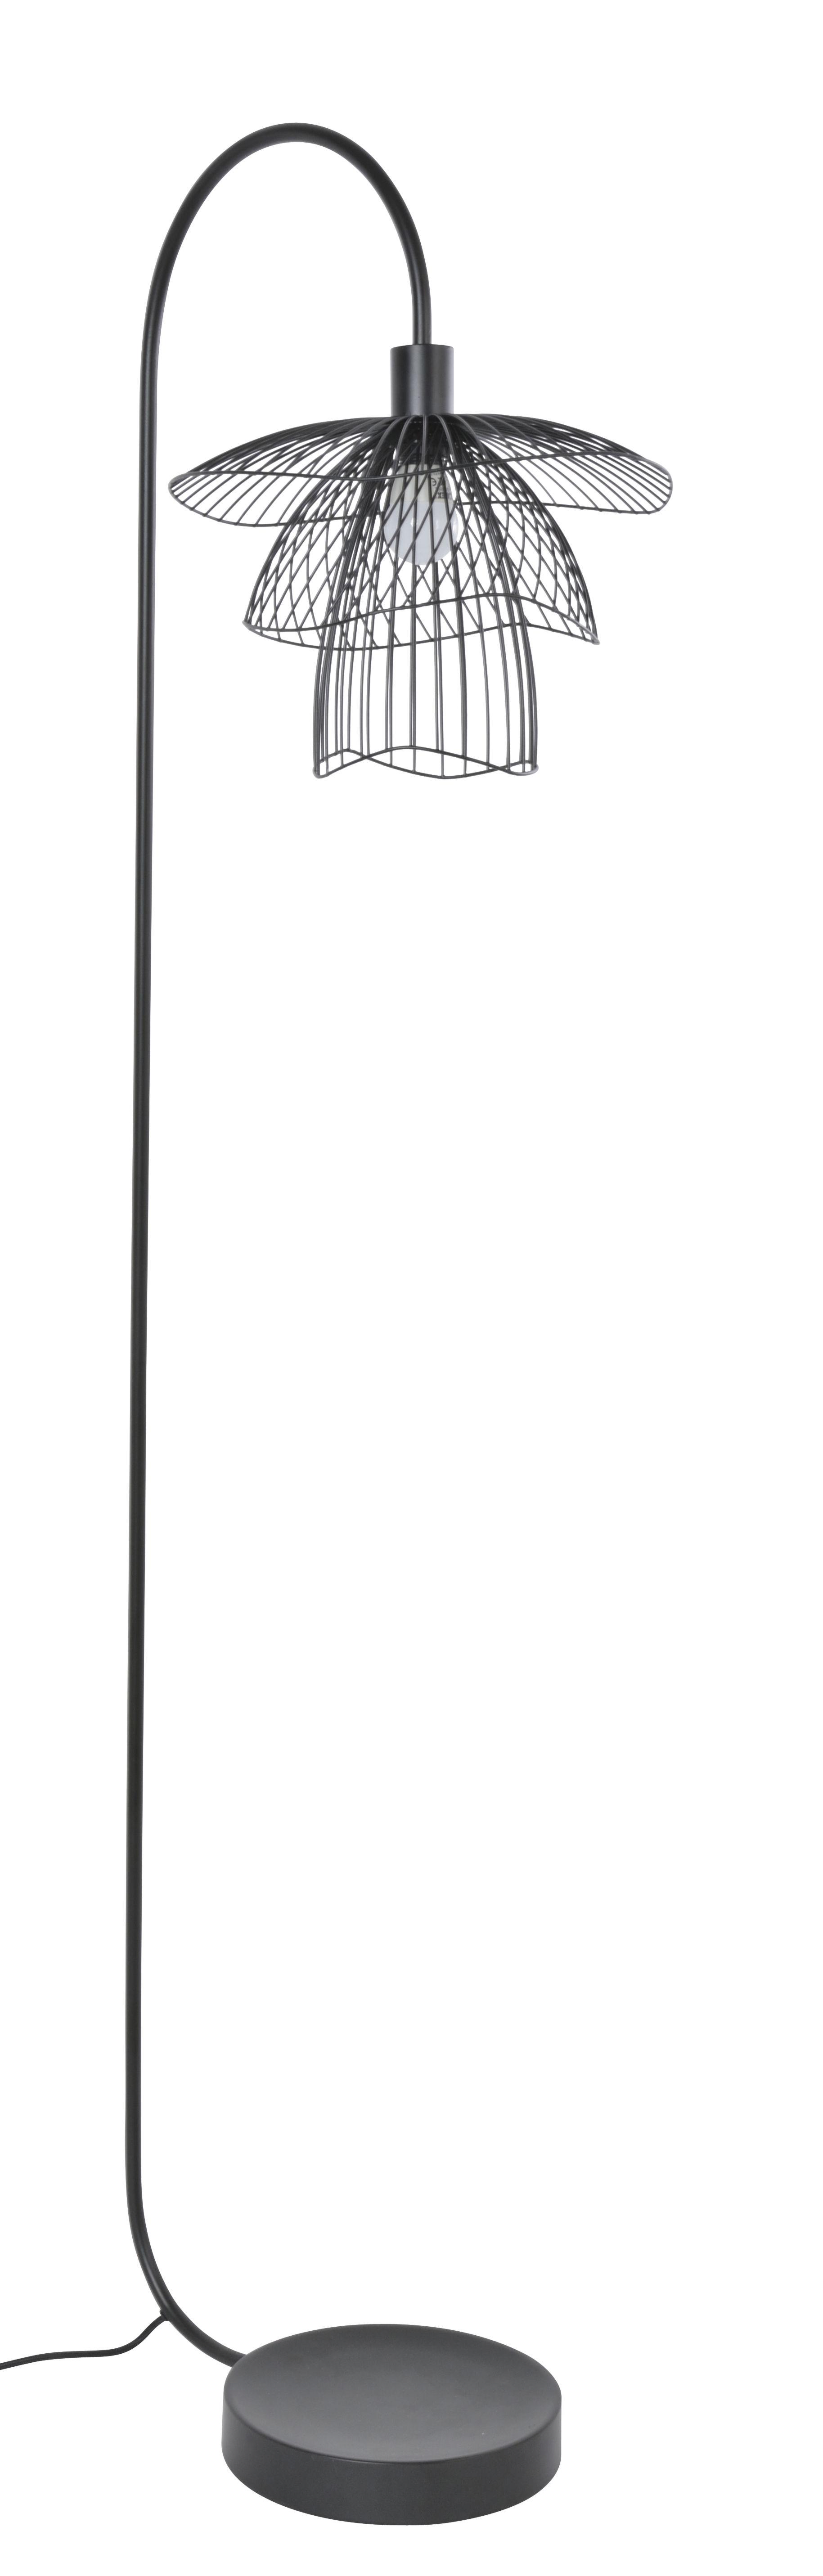 Lighting - Floor lamps - Papillon Floor lamp - / H 150 cm by Forestier - Black - Powder coated steel